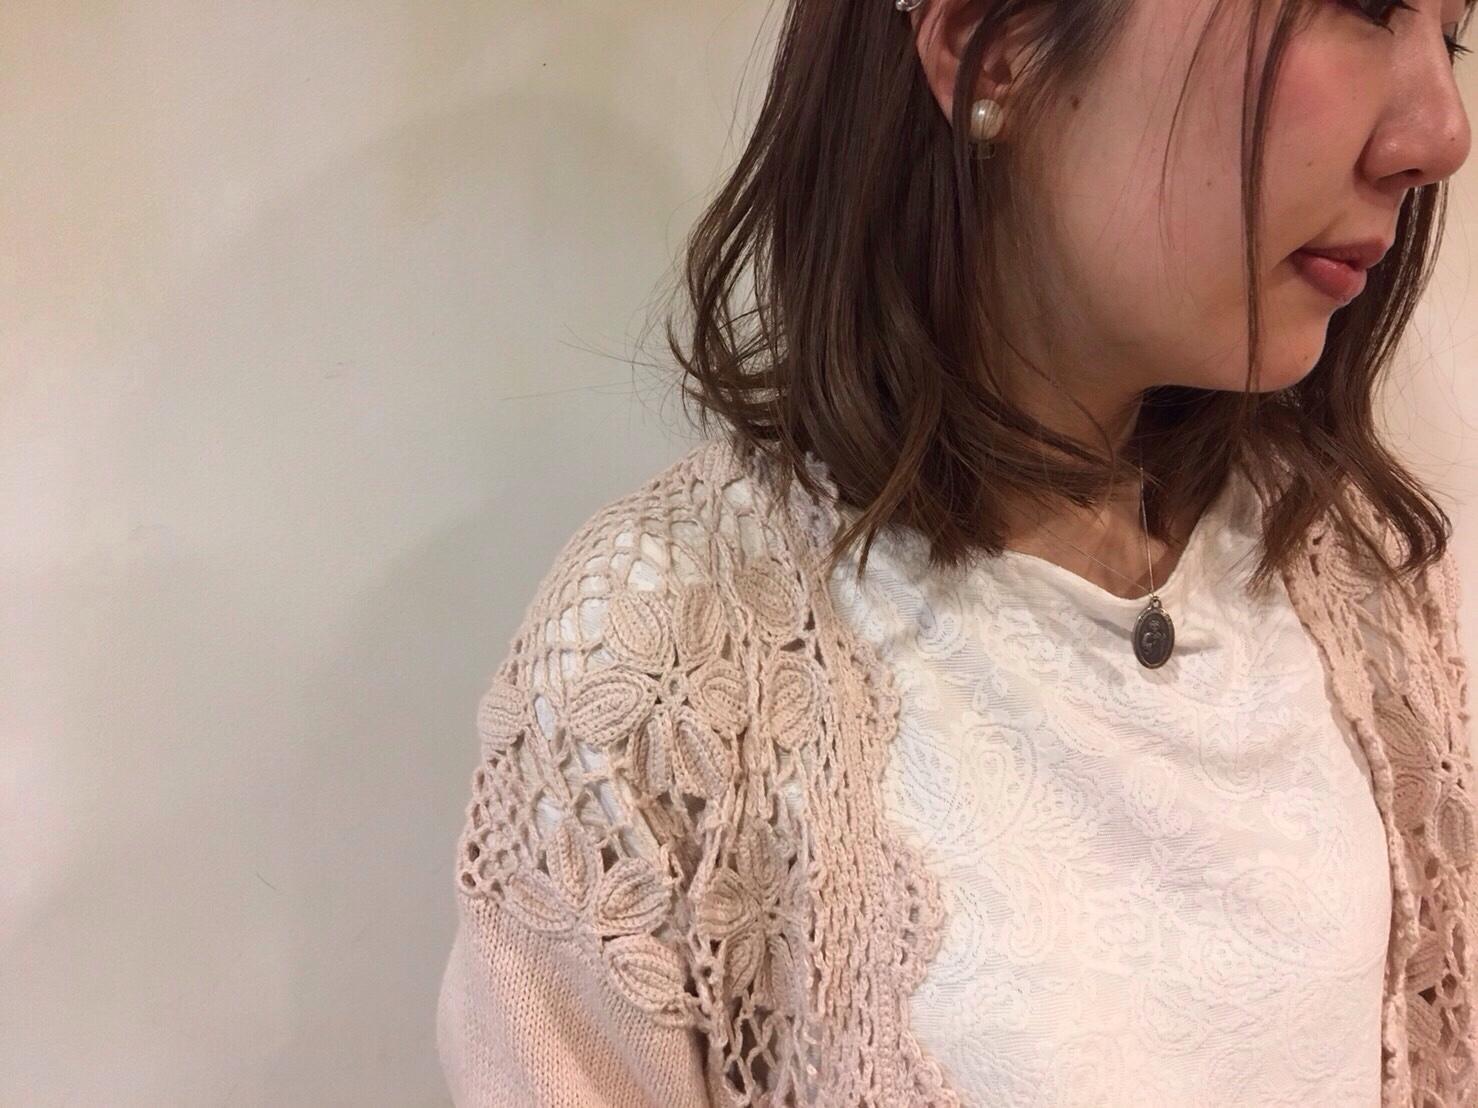 fc2blog_2017030516330588f.jpg